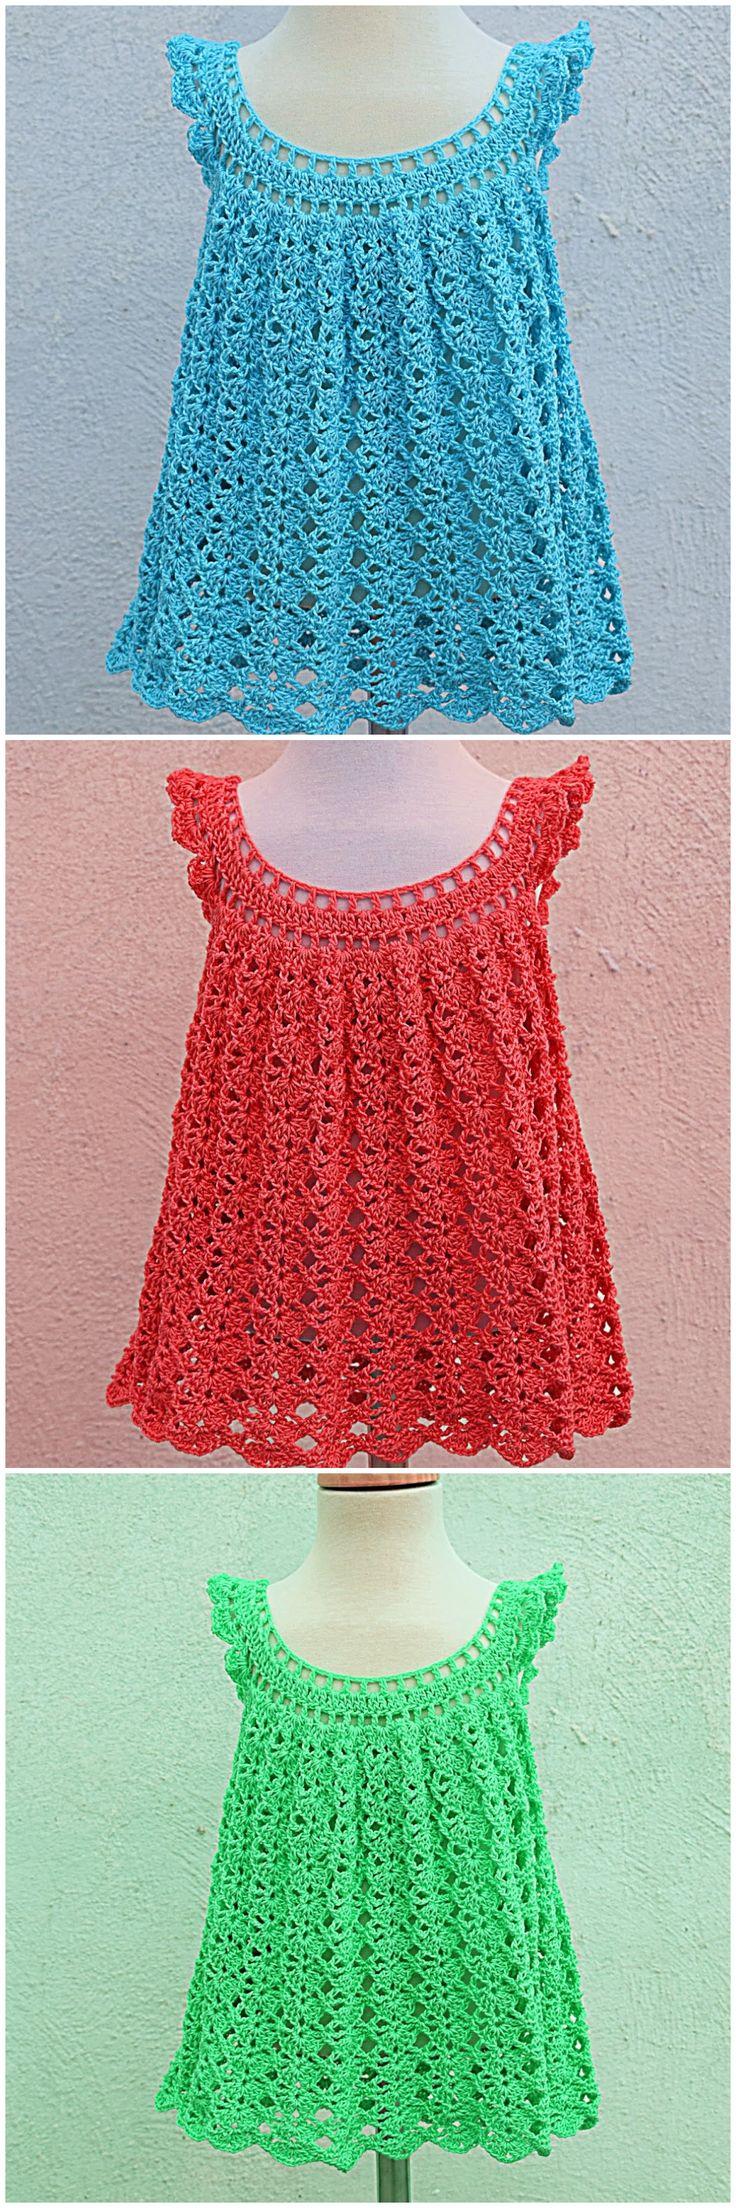 Crochet Fast And Easy Baby Girl Dress For Summer 3